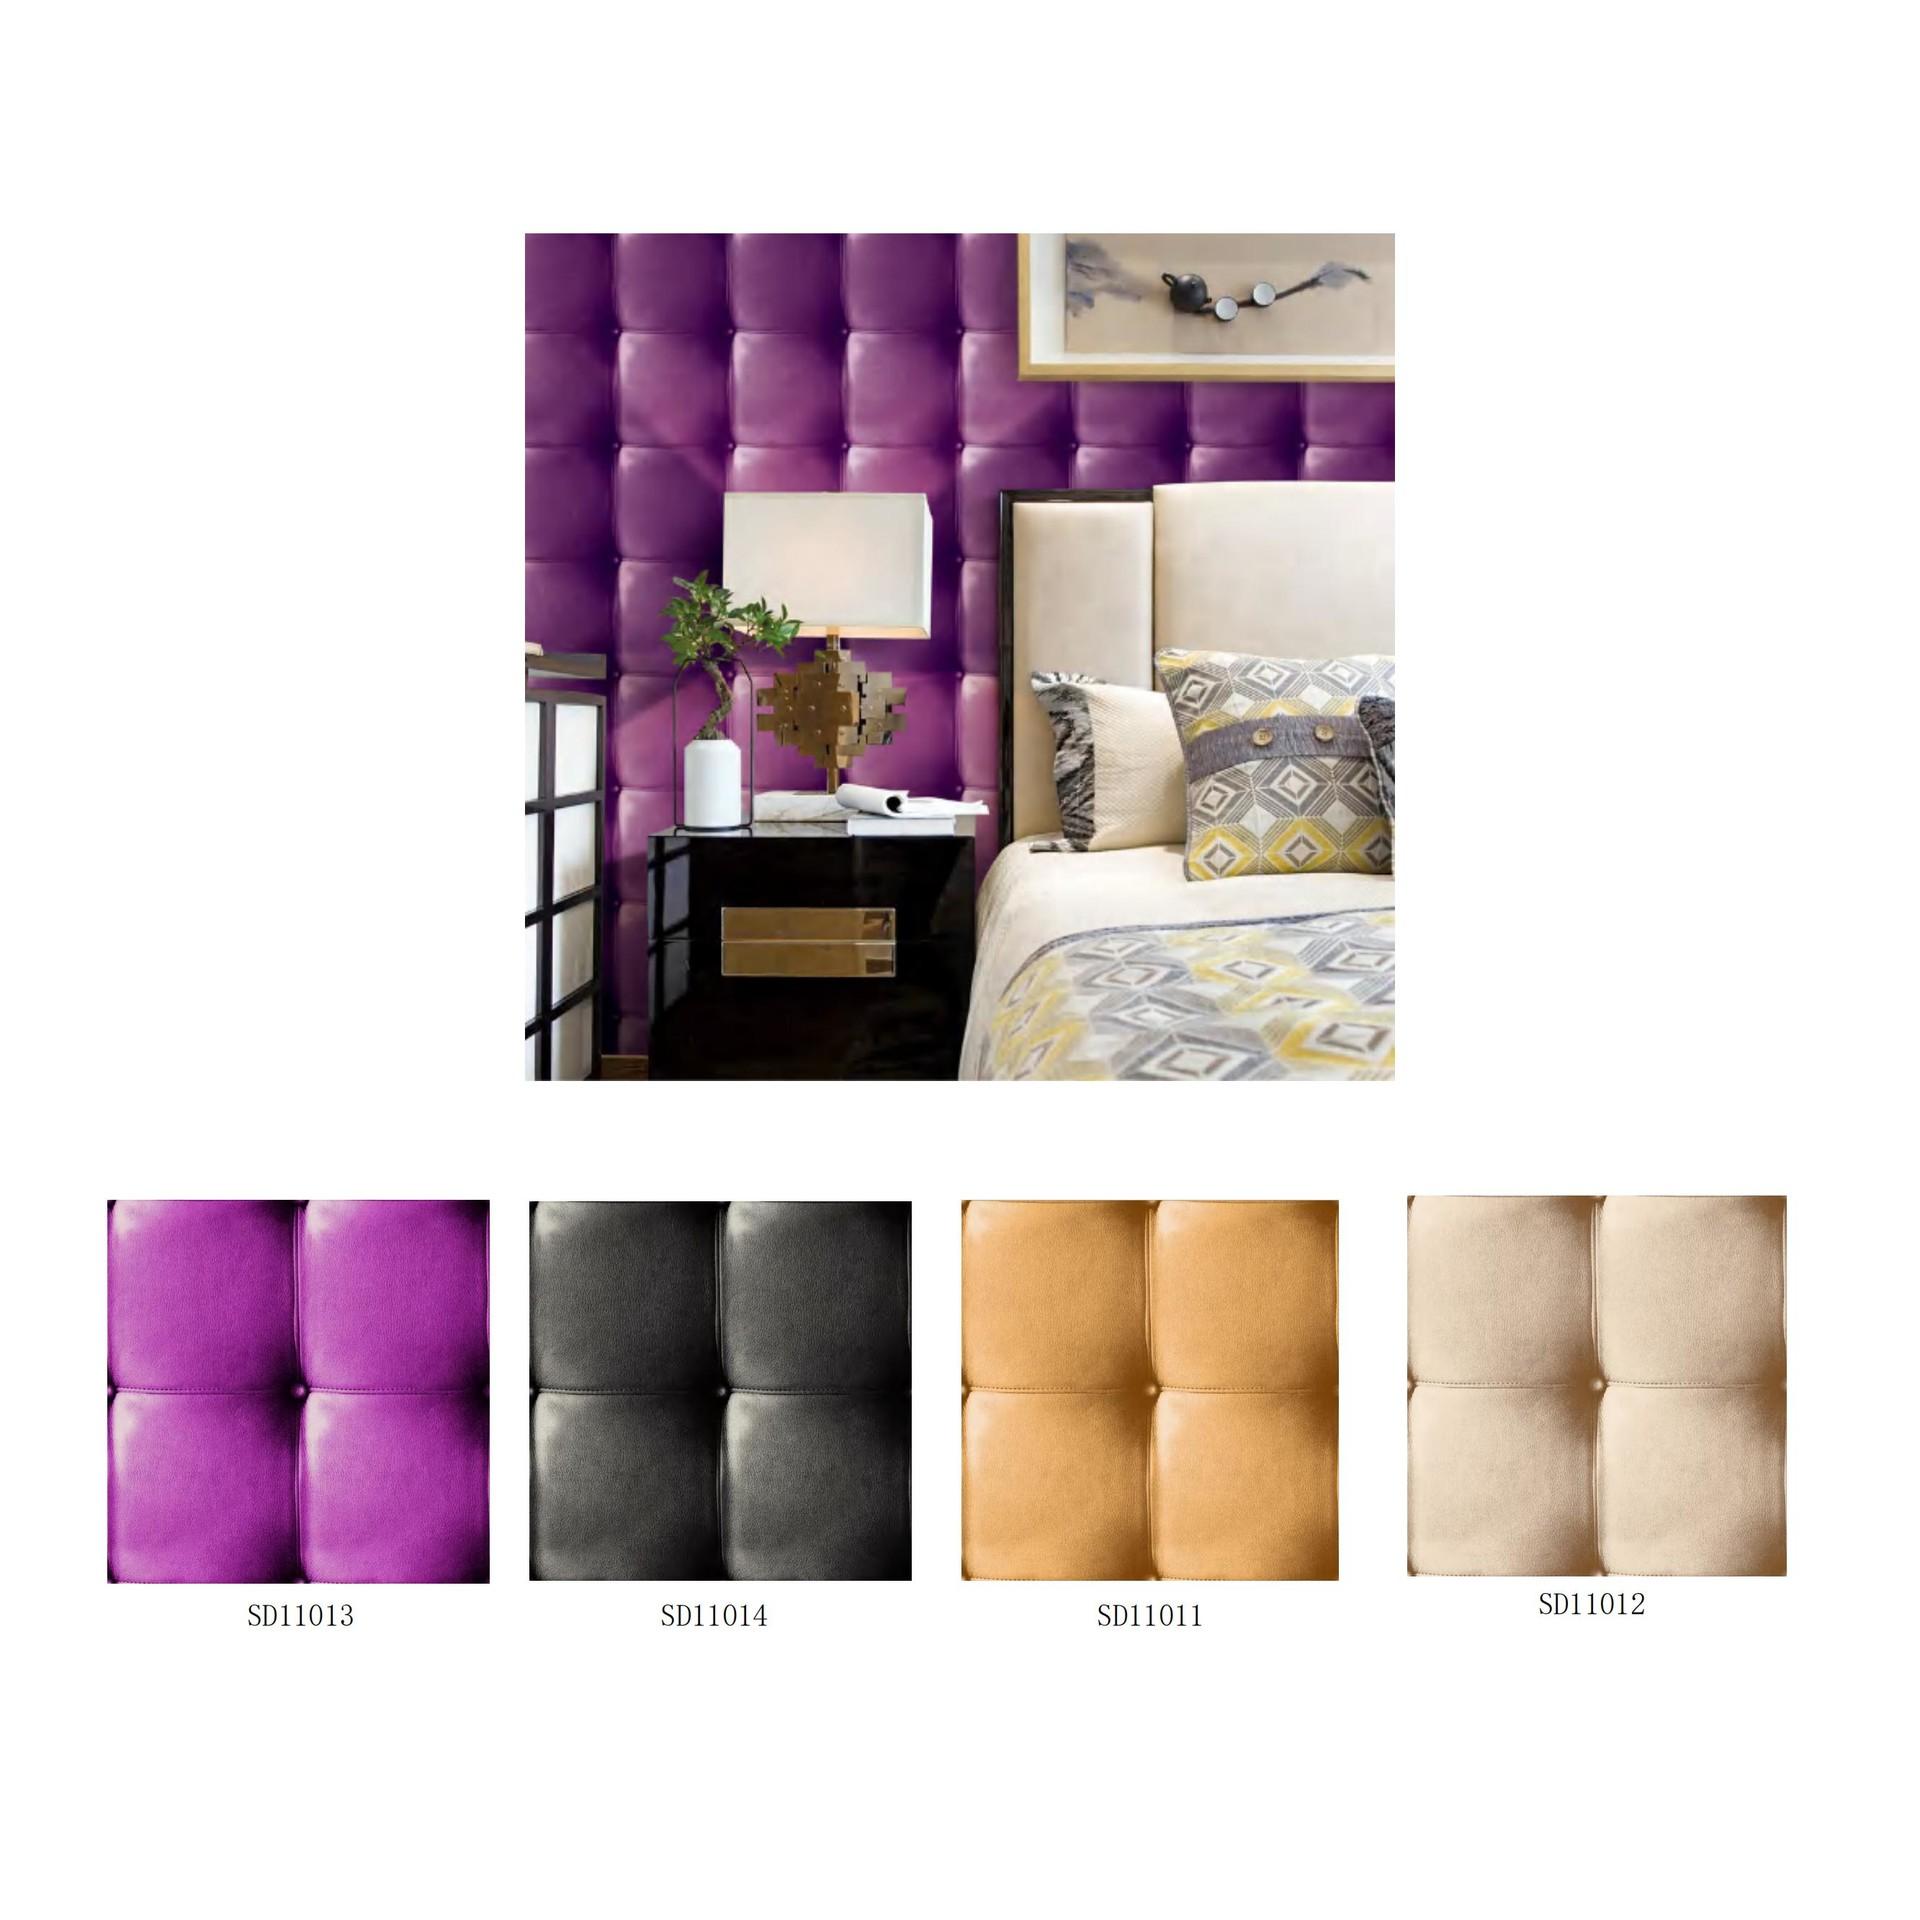 Vinyl imitated sofa background 3D wallpaper cladding